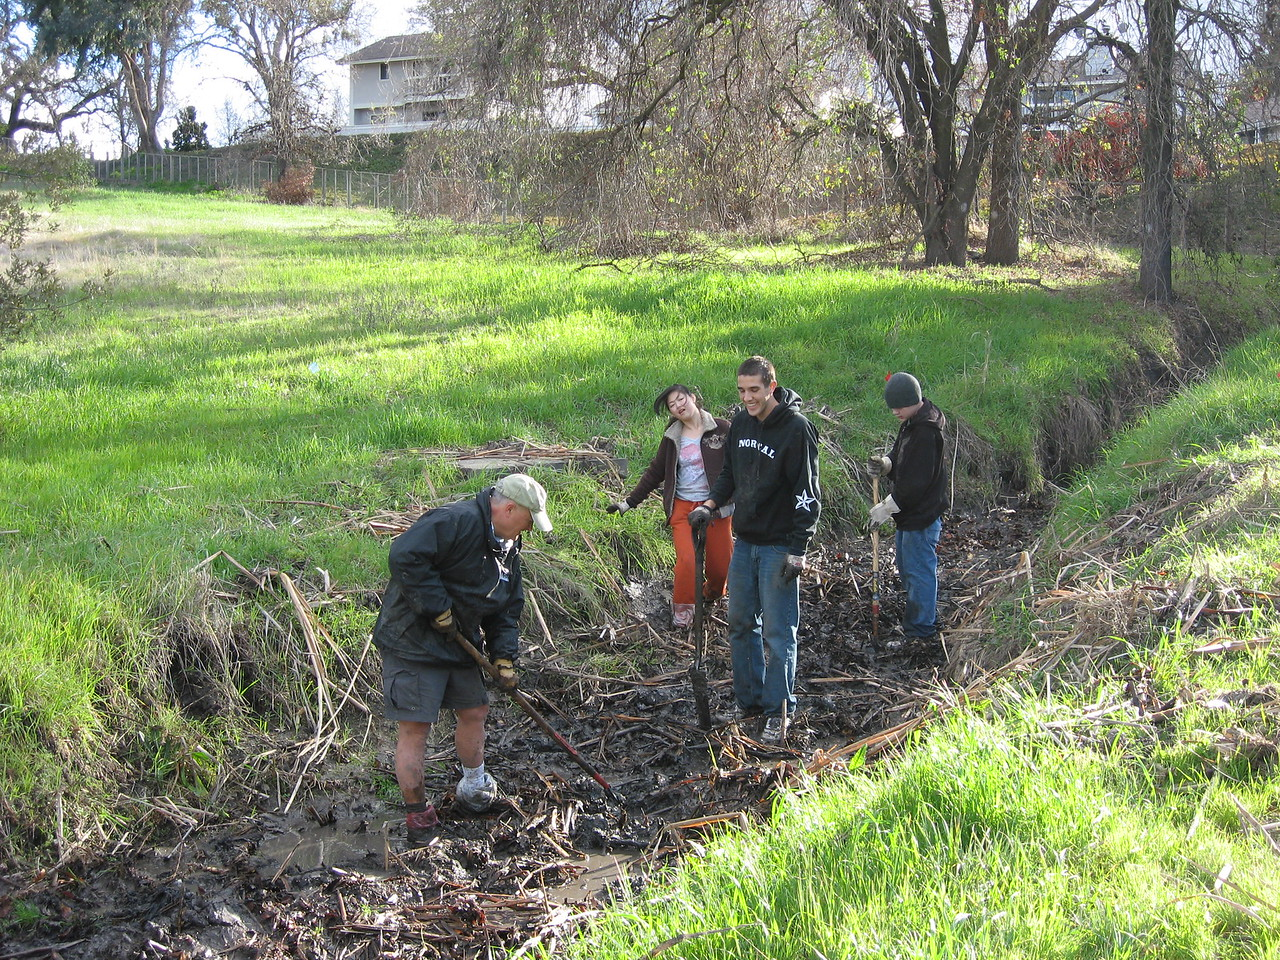 Habitat Restoration at Heather Farm Park - Removing cattails